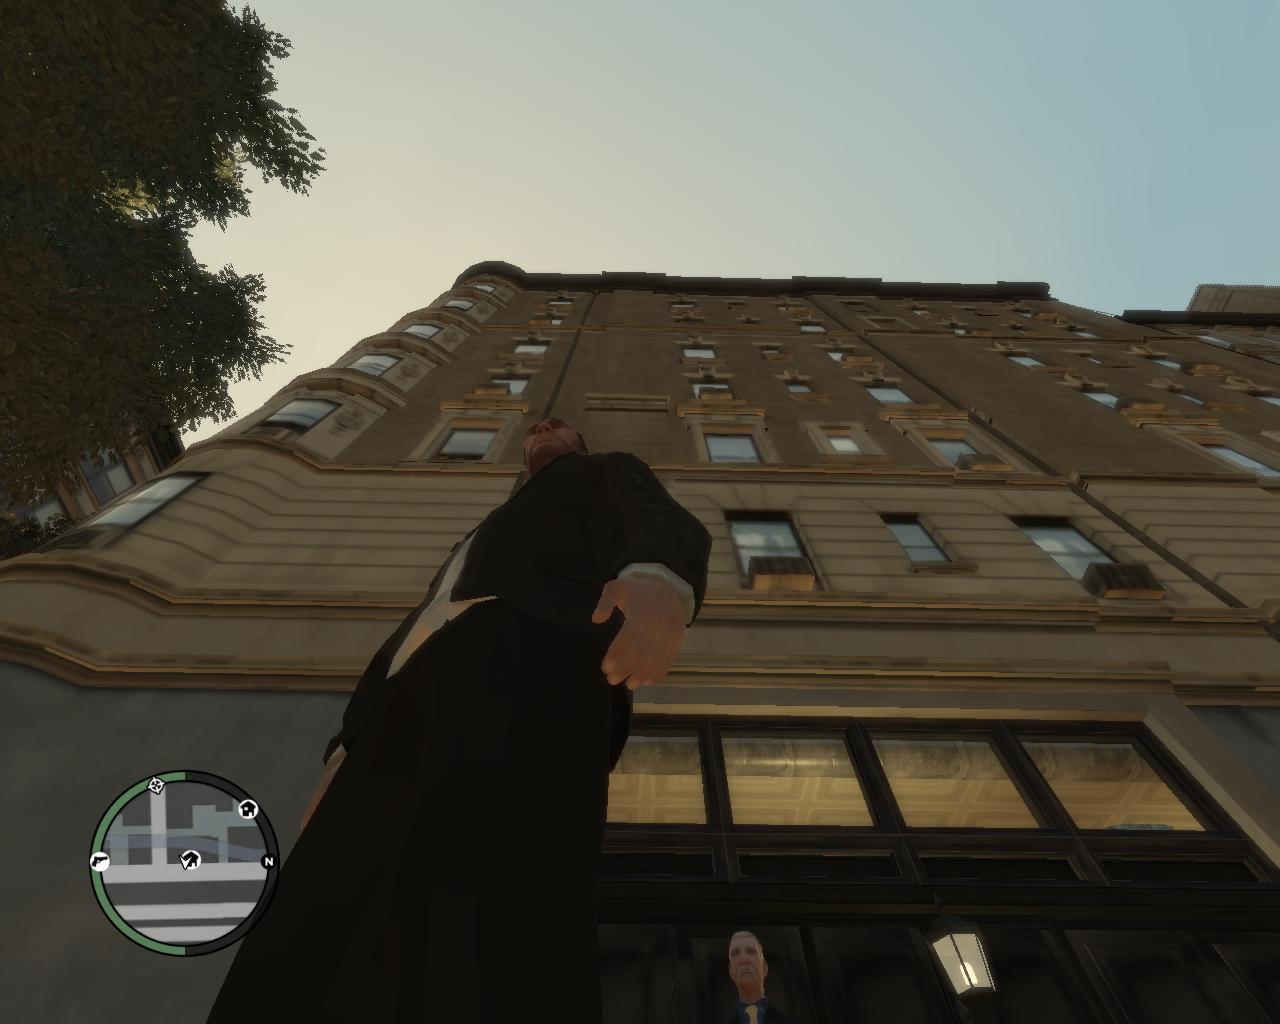 Ля 2 - Grand Theft Auto 4